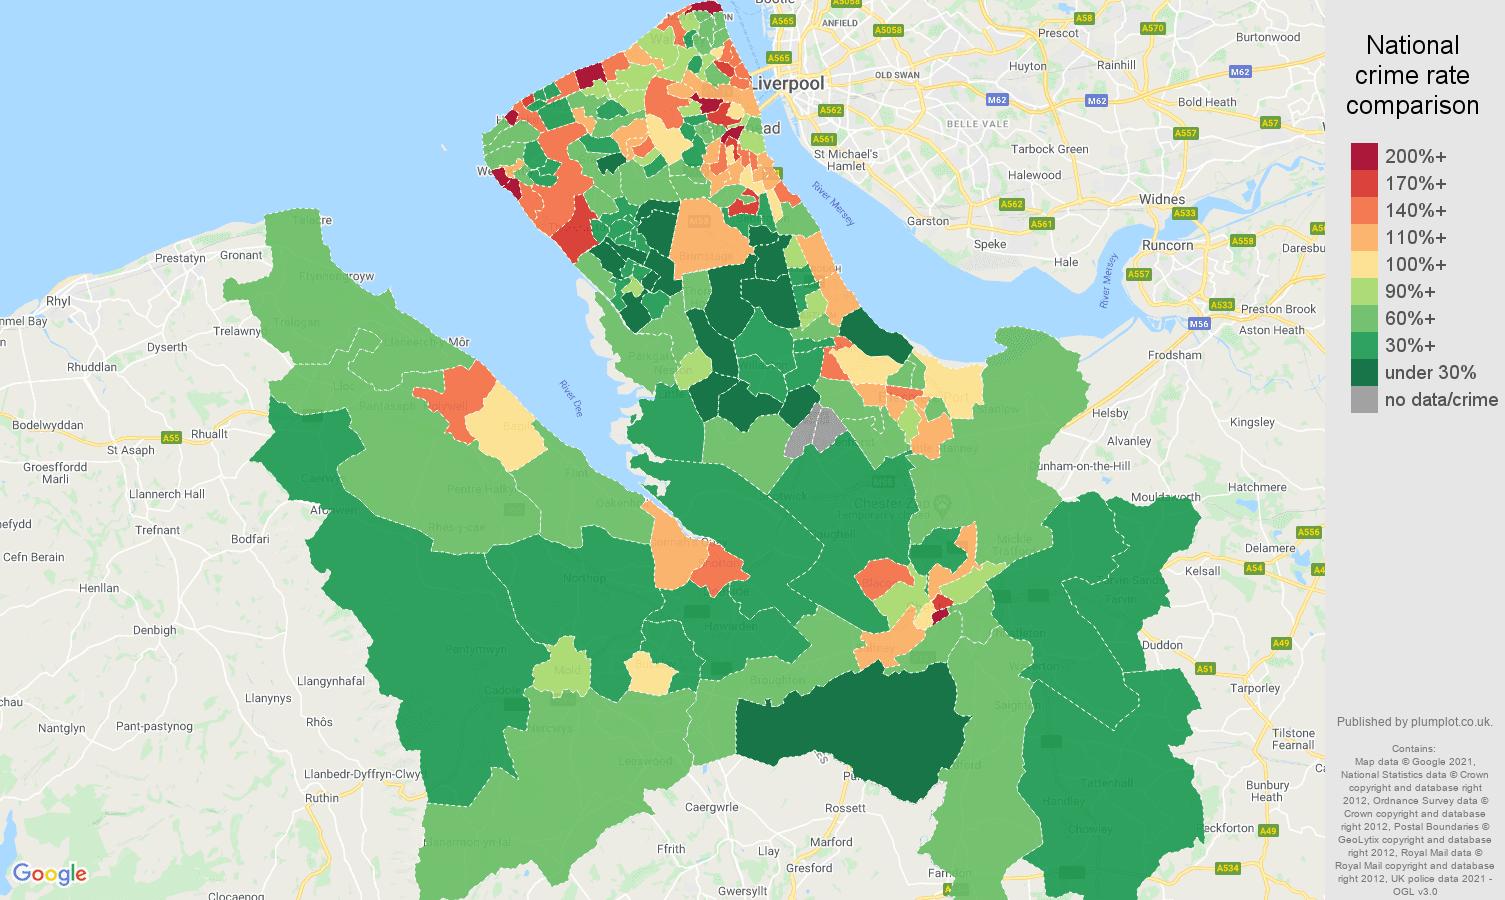 Chester antisocial behaviour crime rate comparison map